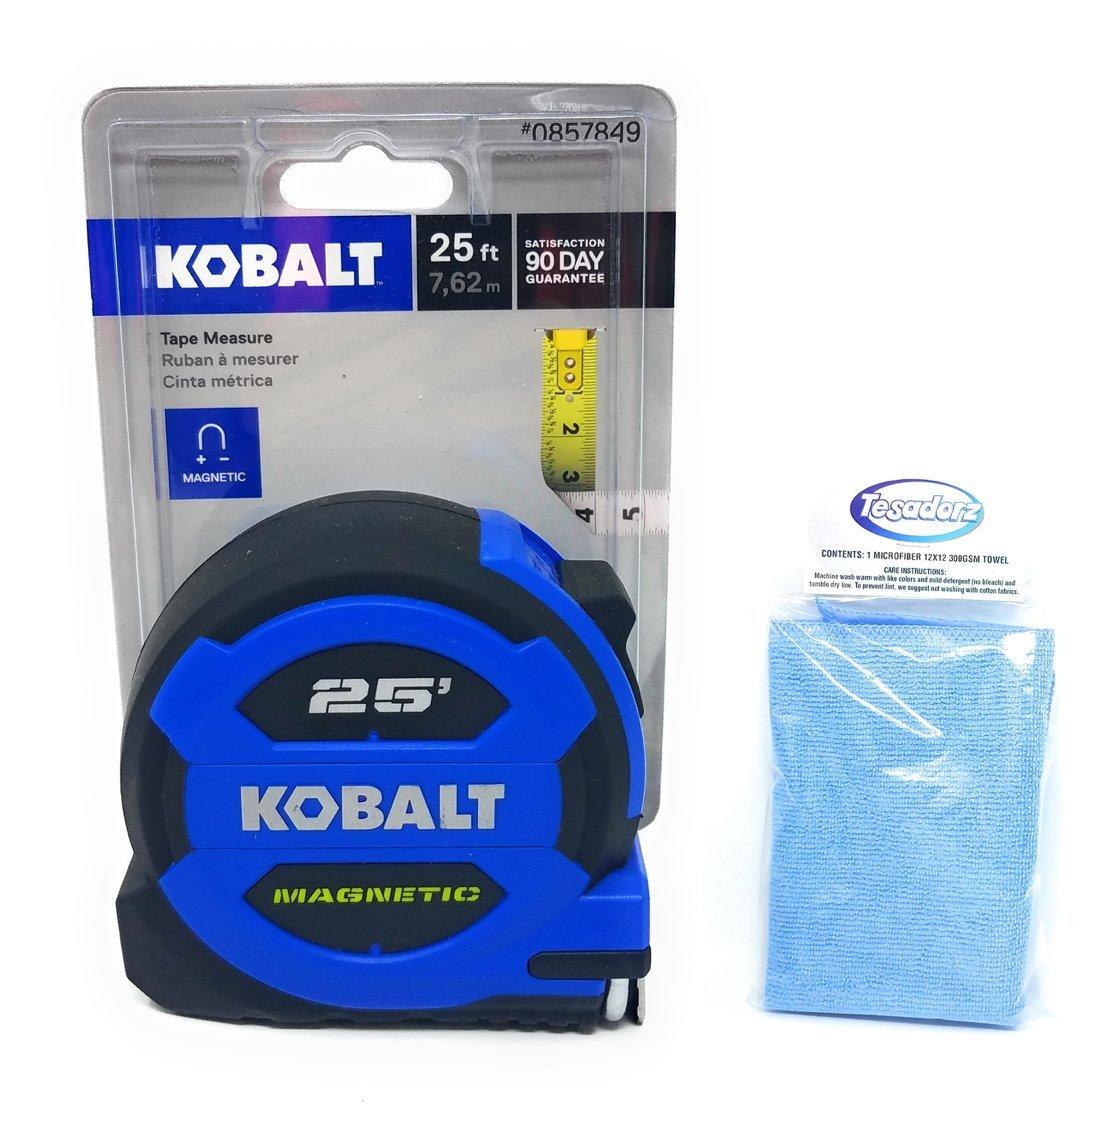 Kobalt 25' Magnetic Tape Measure and Tesadorz Microfiber Cloth